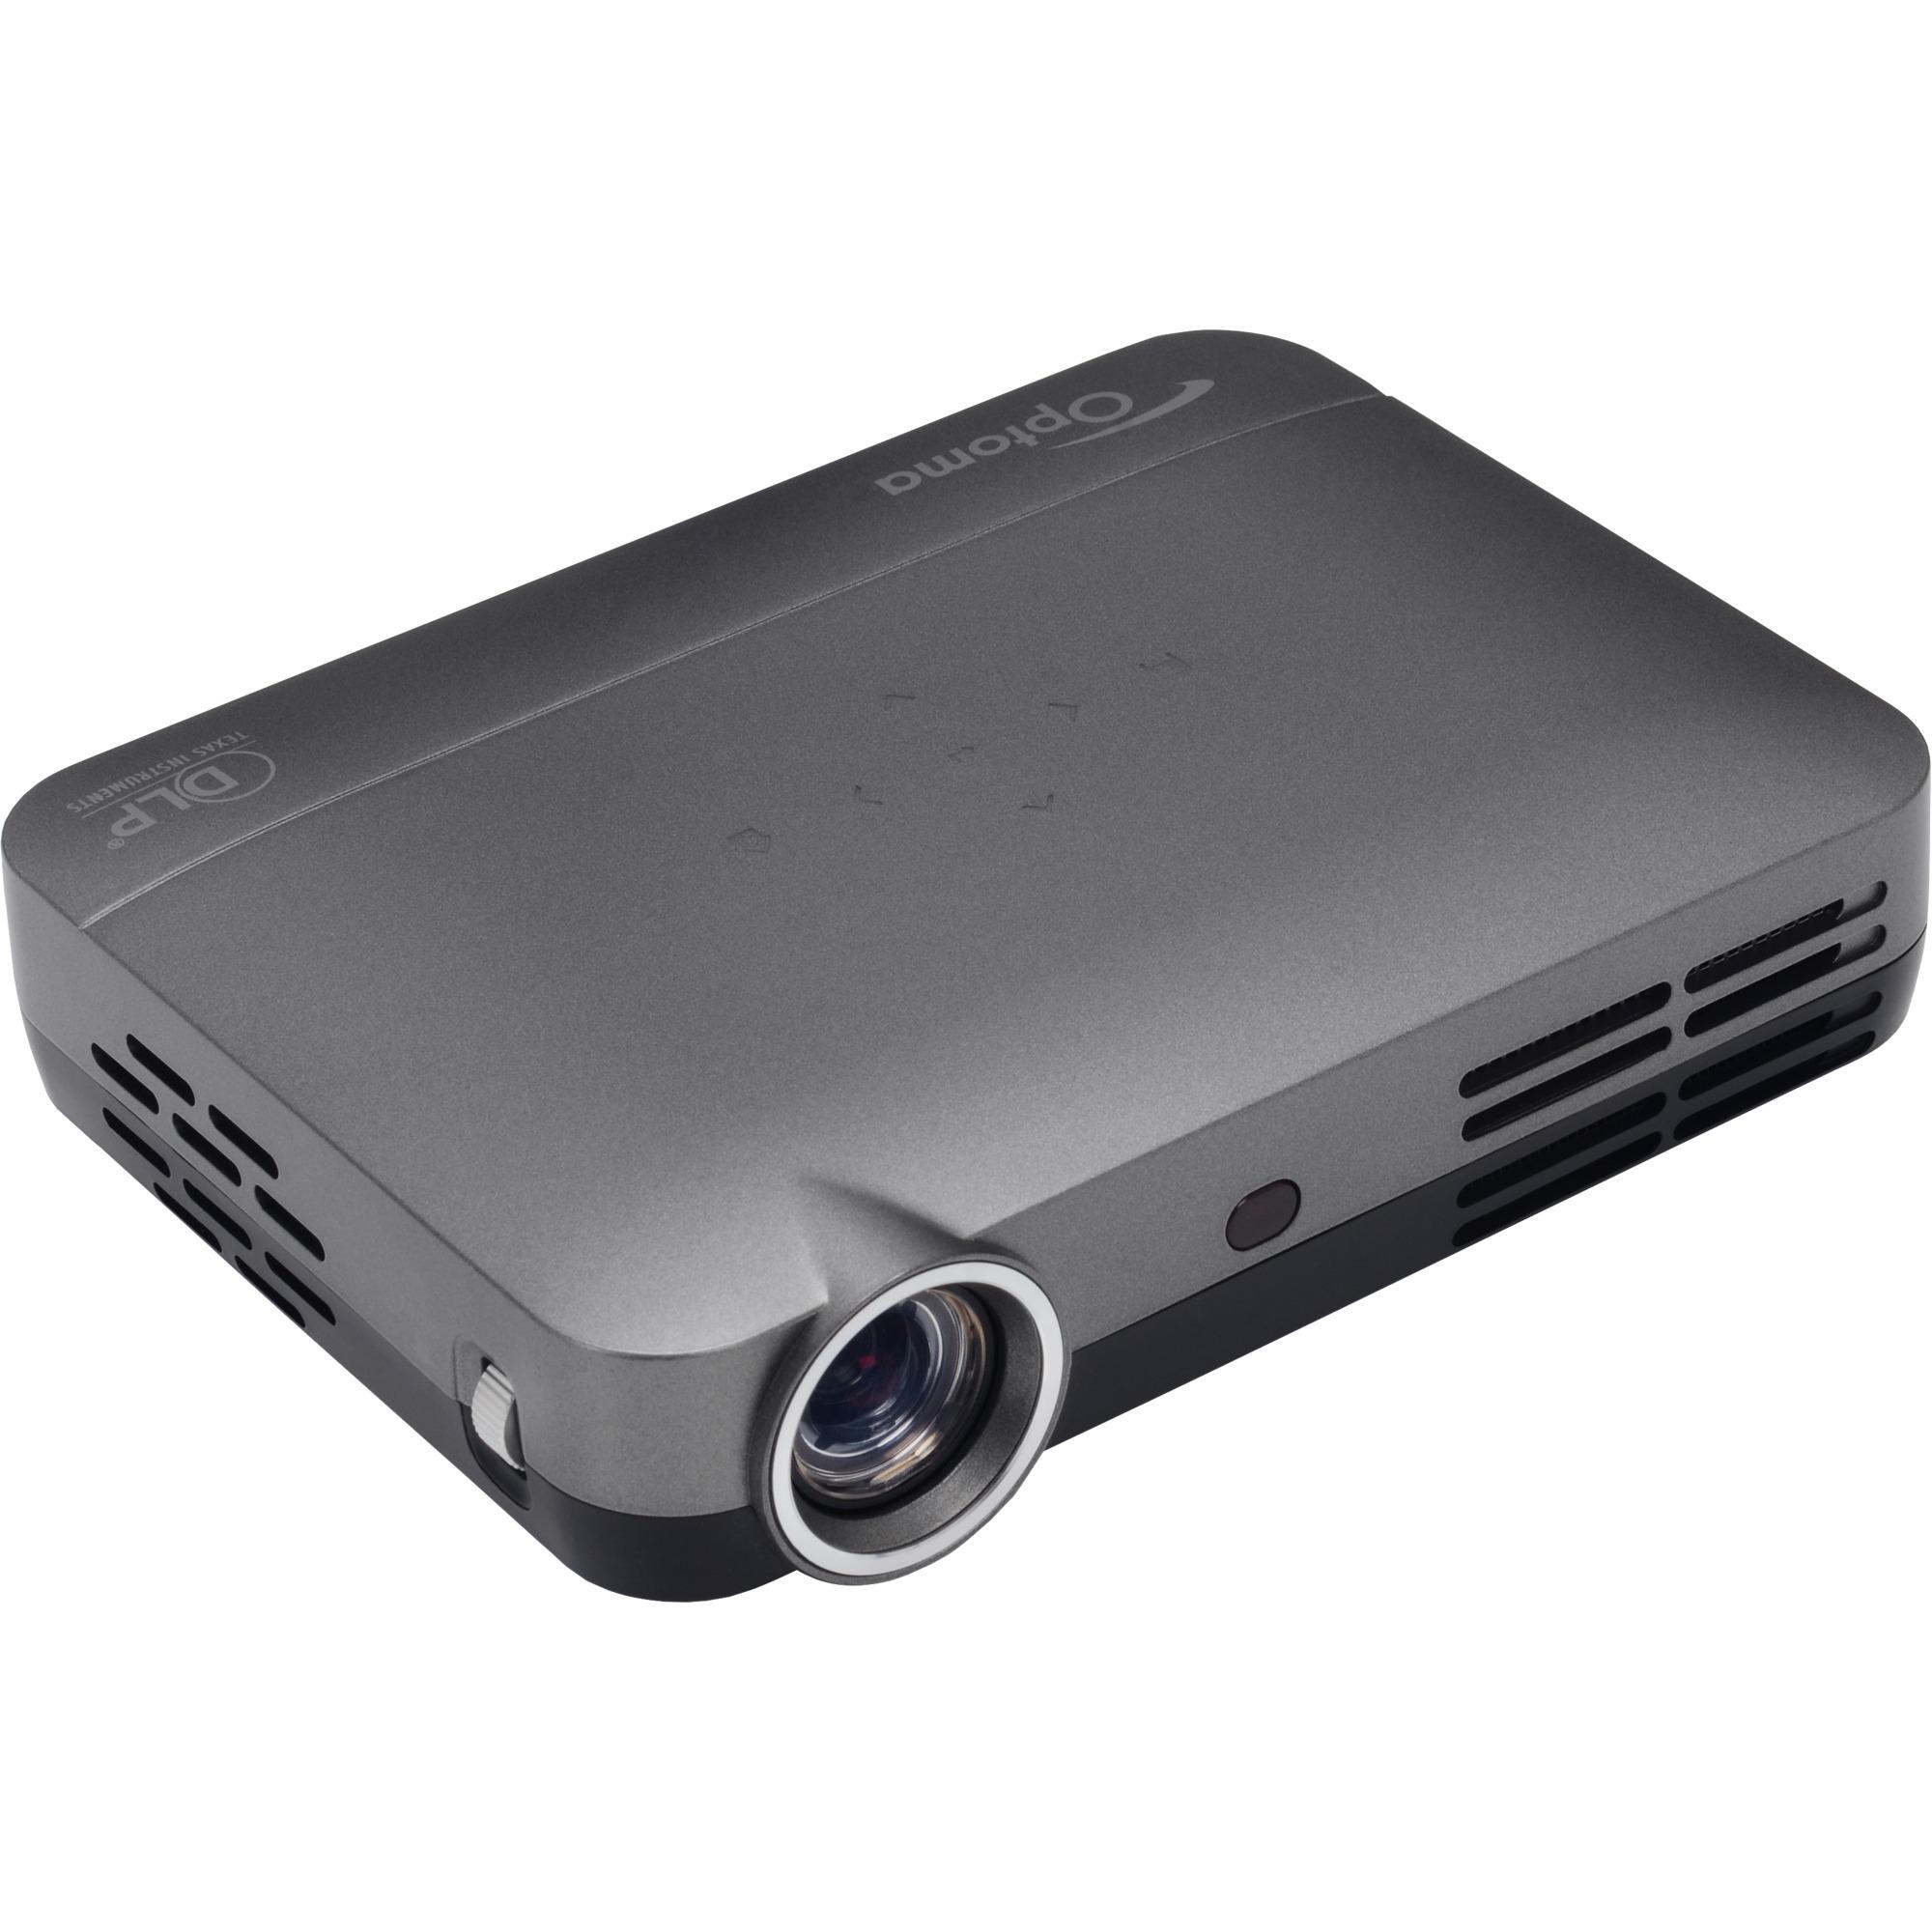 ML330 Proyector portátil 500lúmenes ANSI DLP WXGA (1280x800) 3D Gris videoproyector, Proyector...